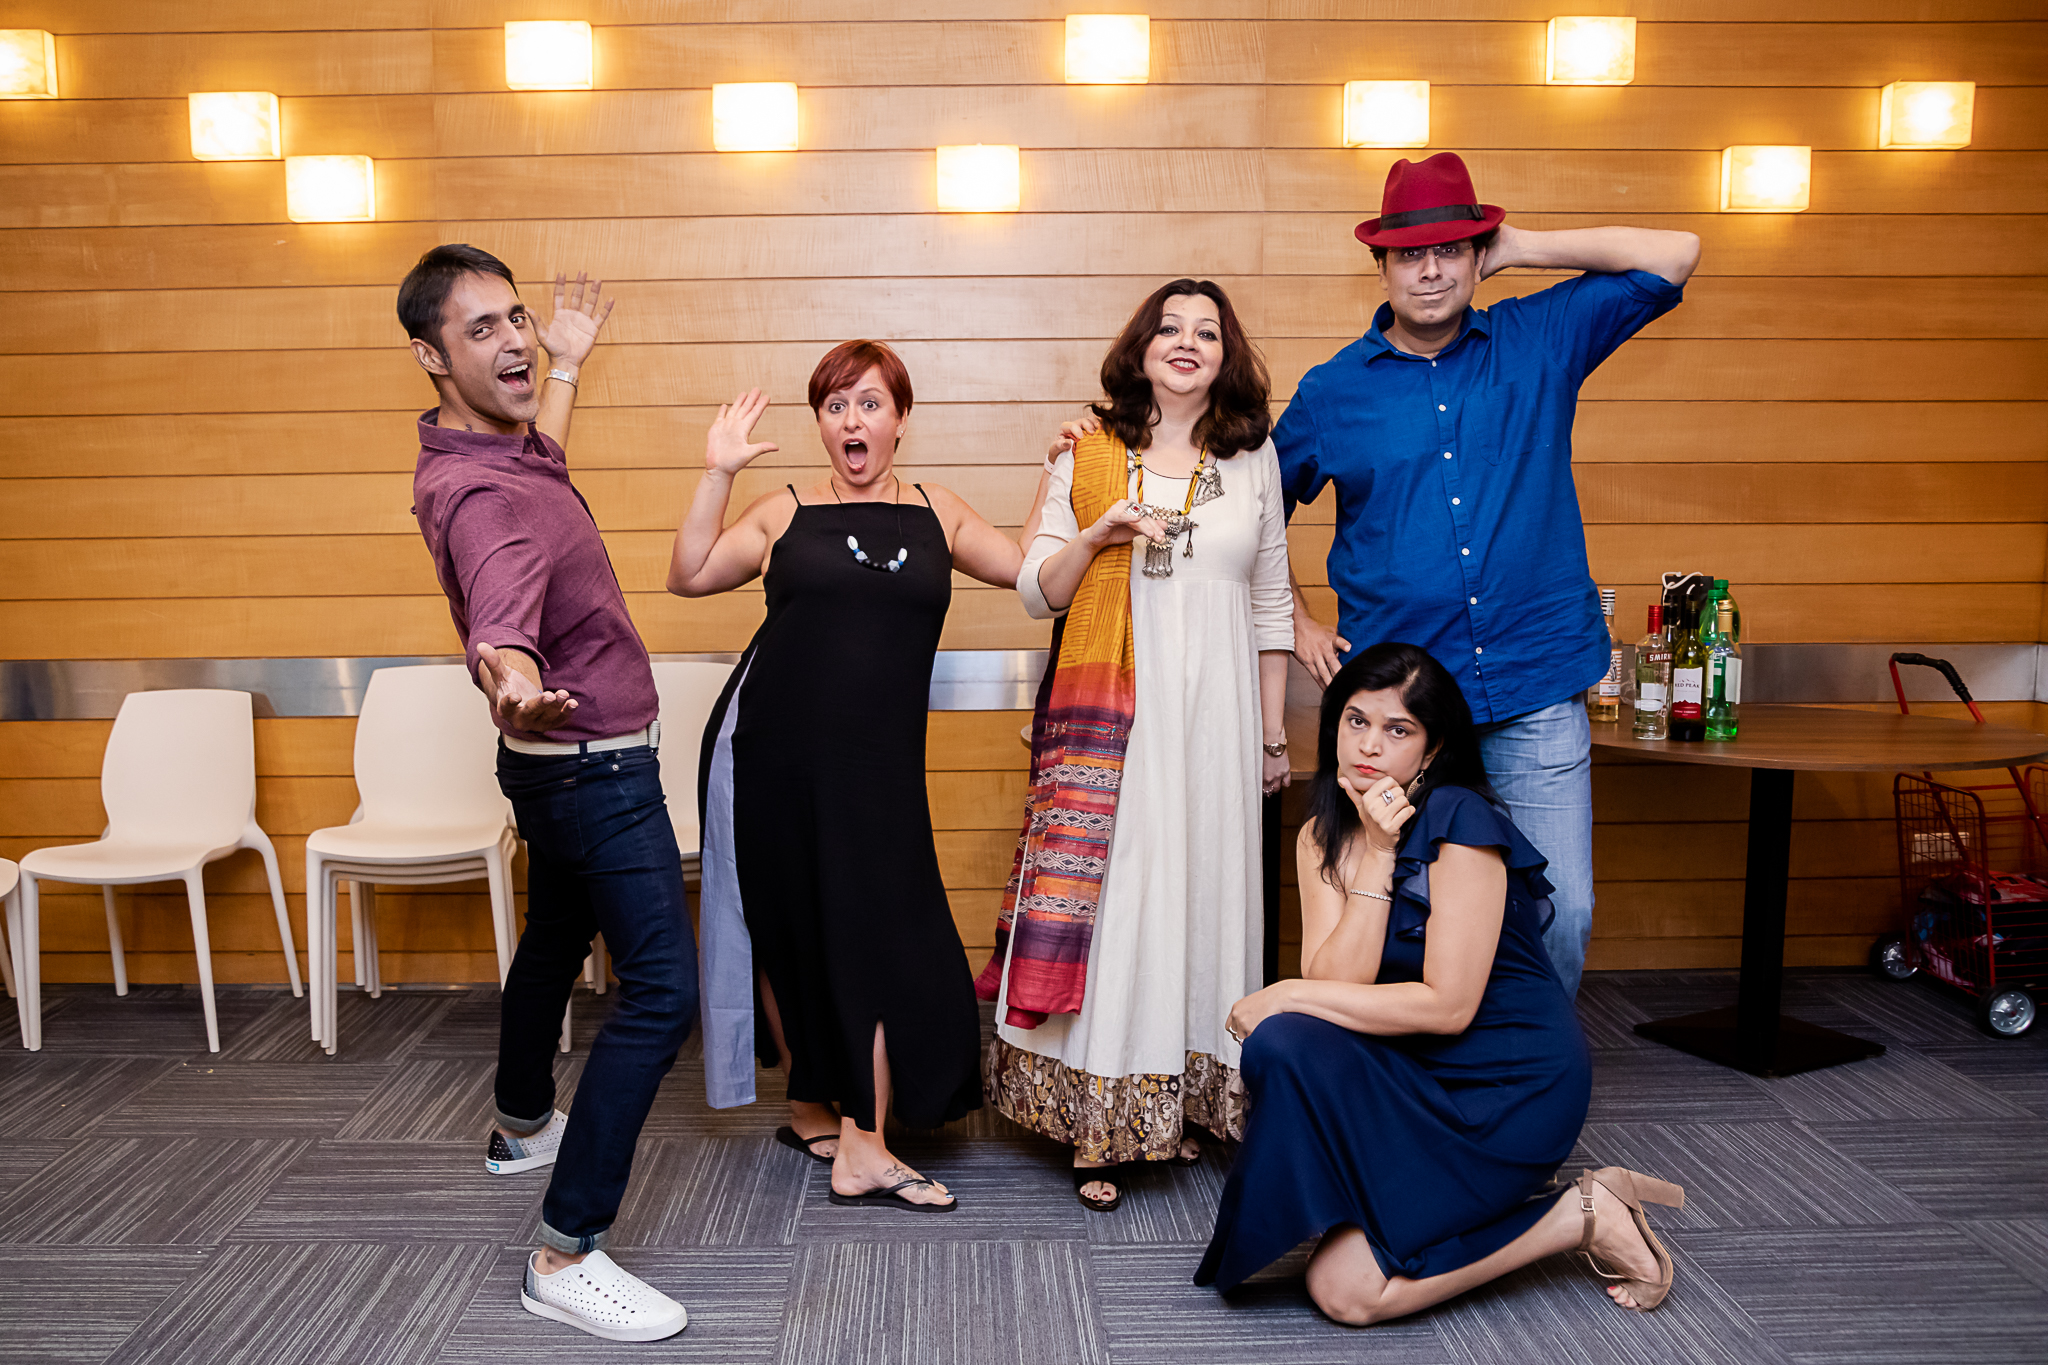 O'Hello (L to R) Neeraj Sujanani, Leah Fellstad, Sonali Mehta (Director), Shalima & Himanshu Motial